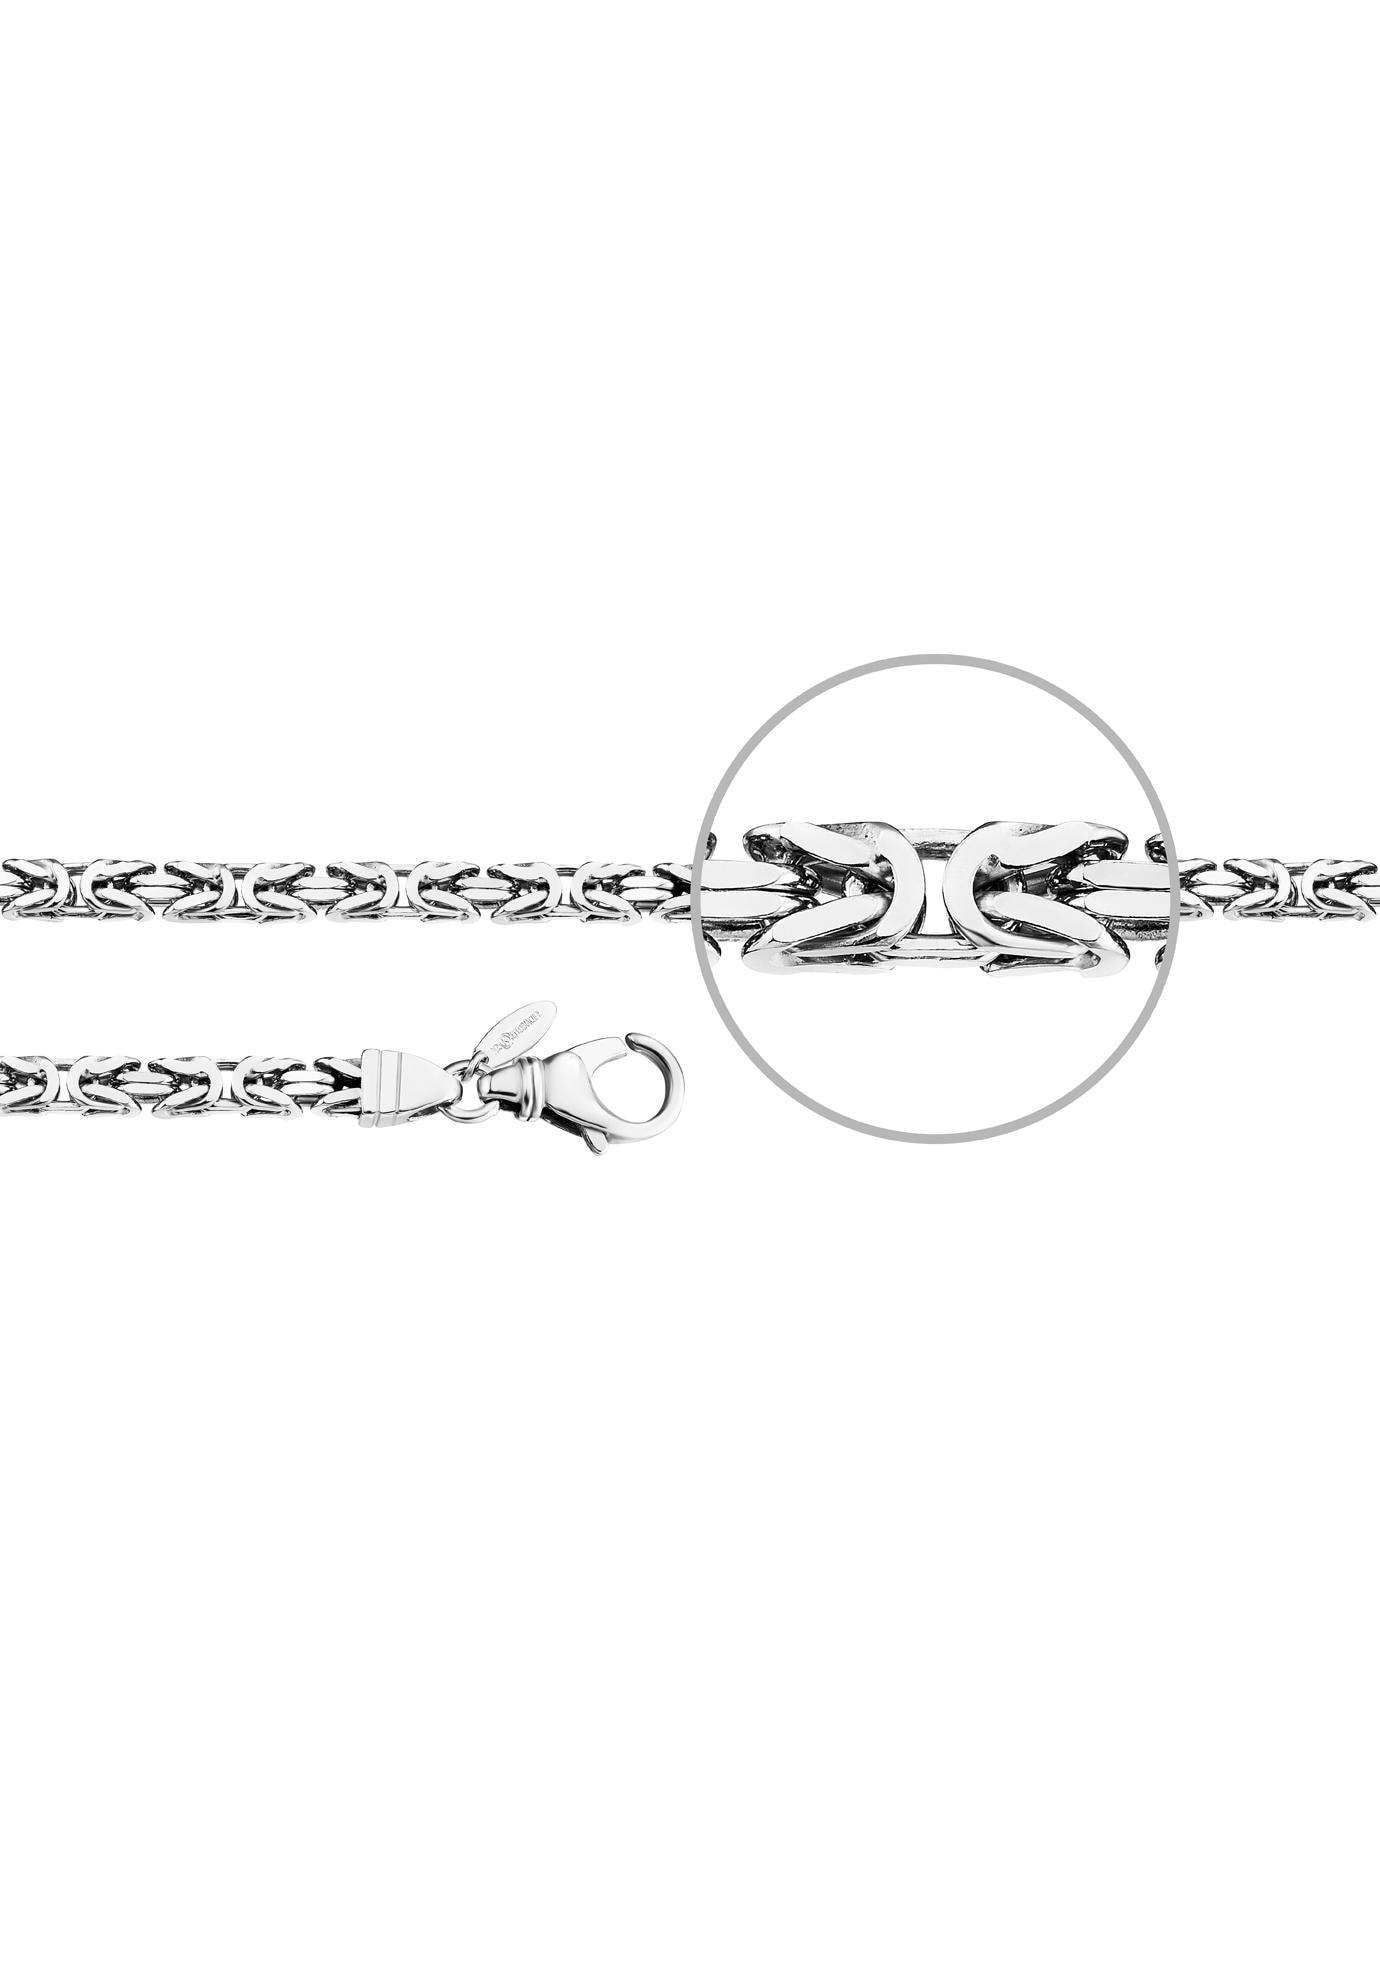 Der Kettenmacher Königsarmband KÖ3-19S, KÖ3-21S, KÖ3-23S günstig online kaufen